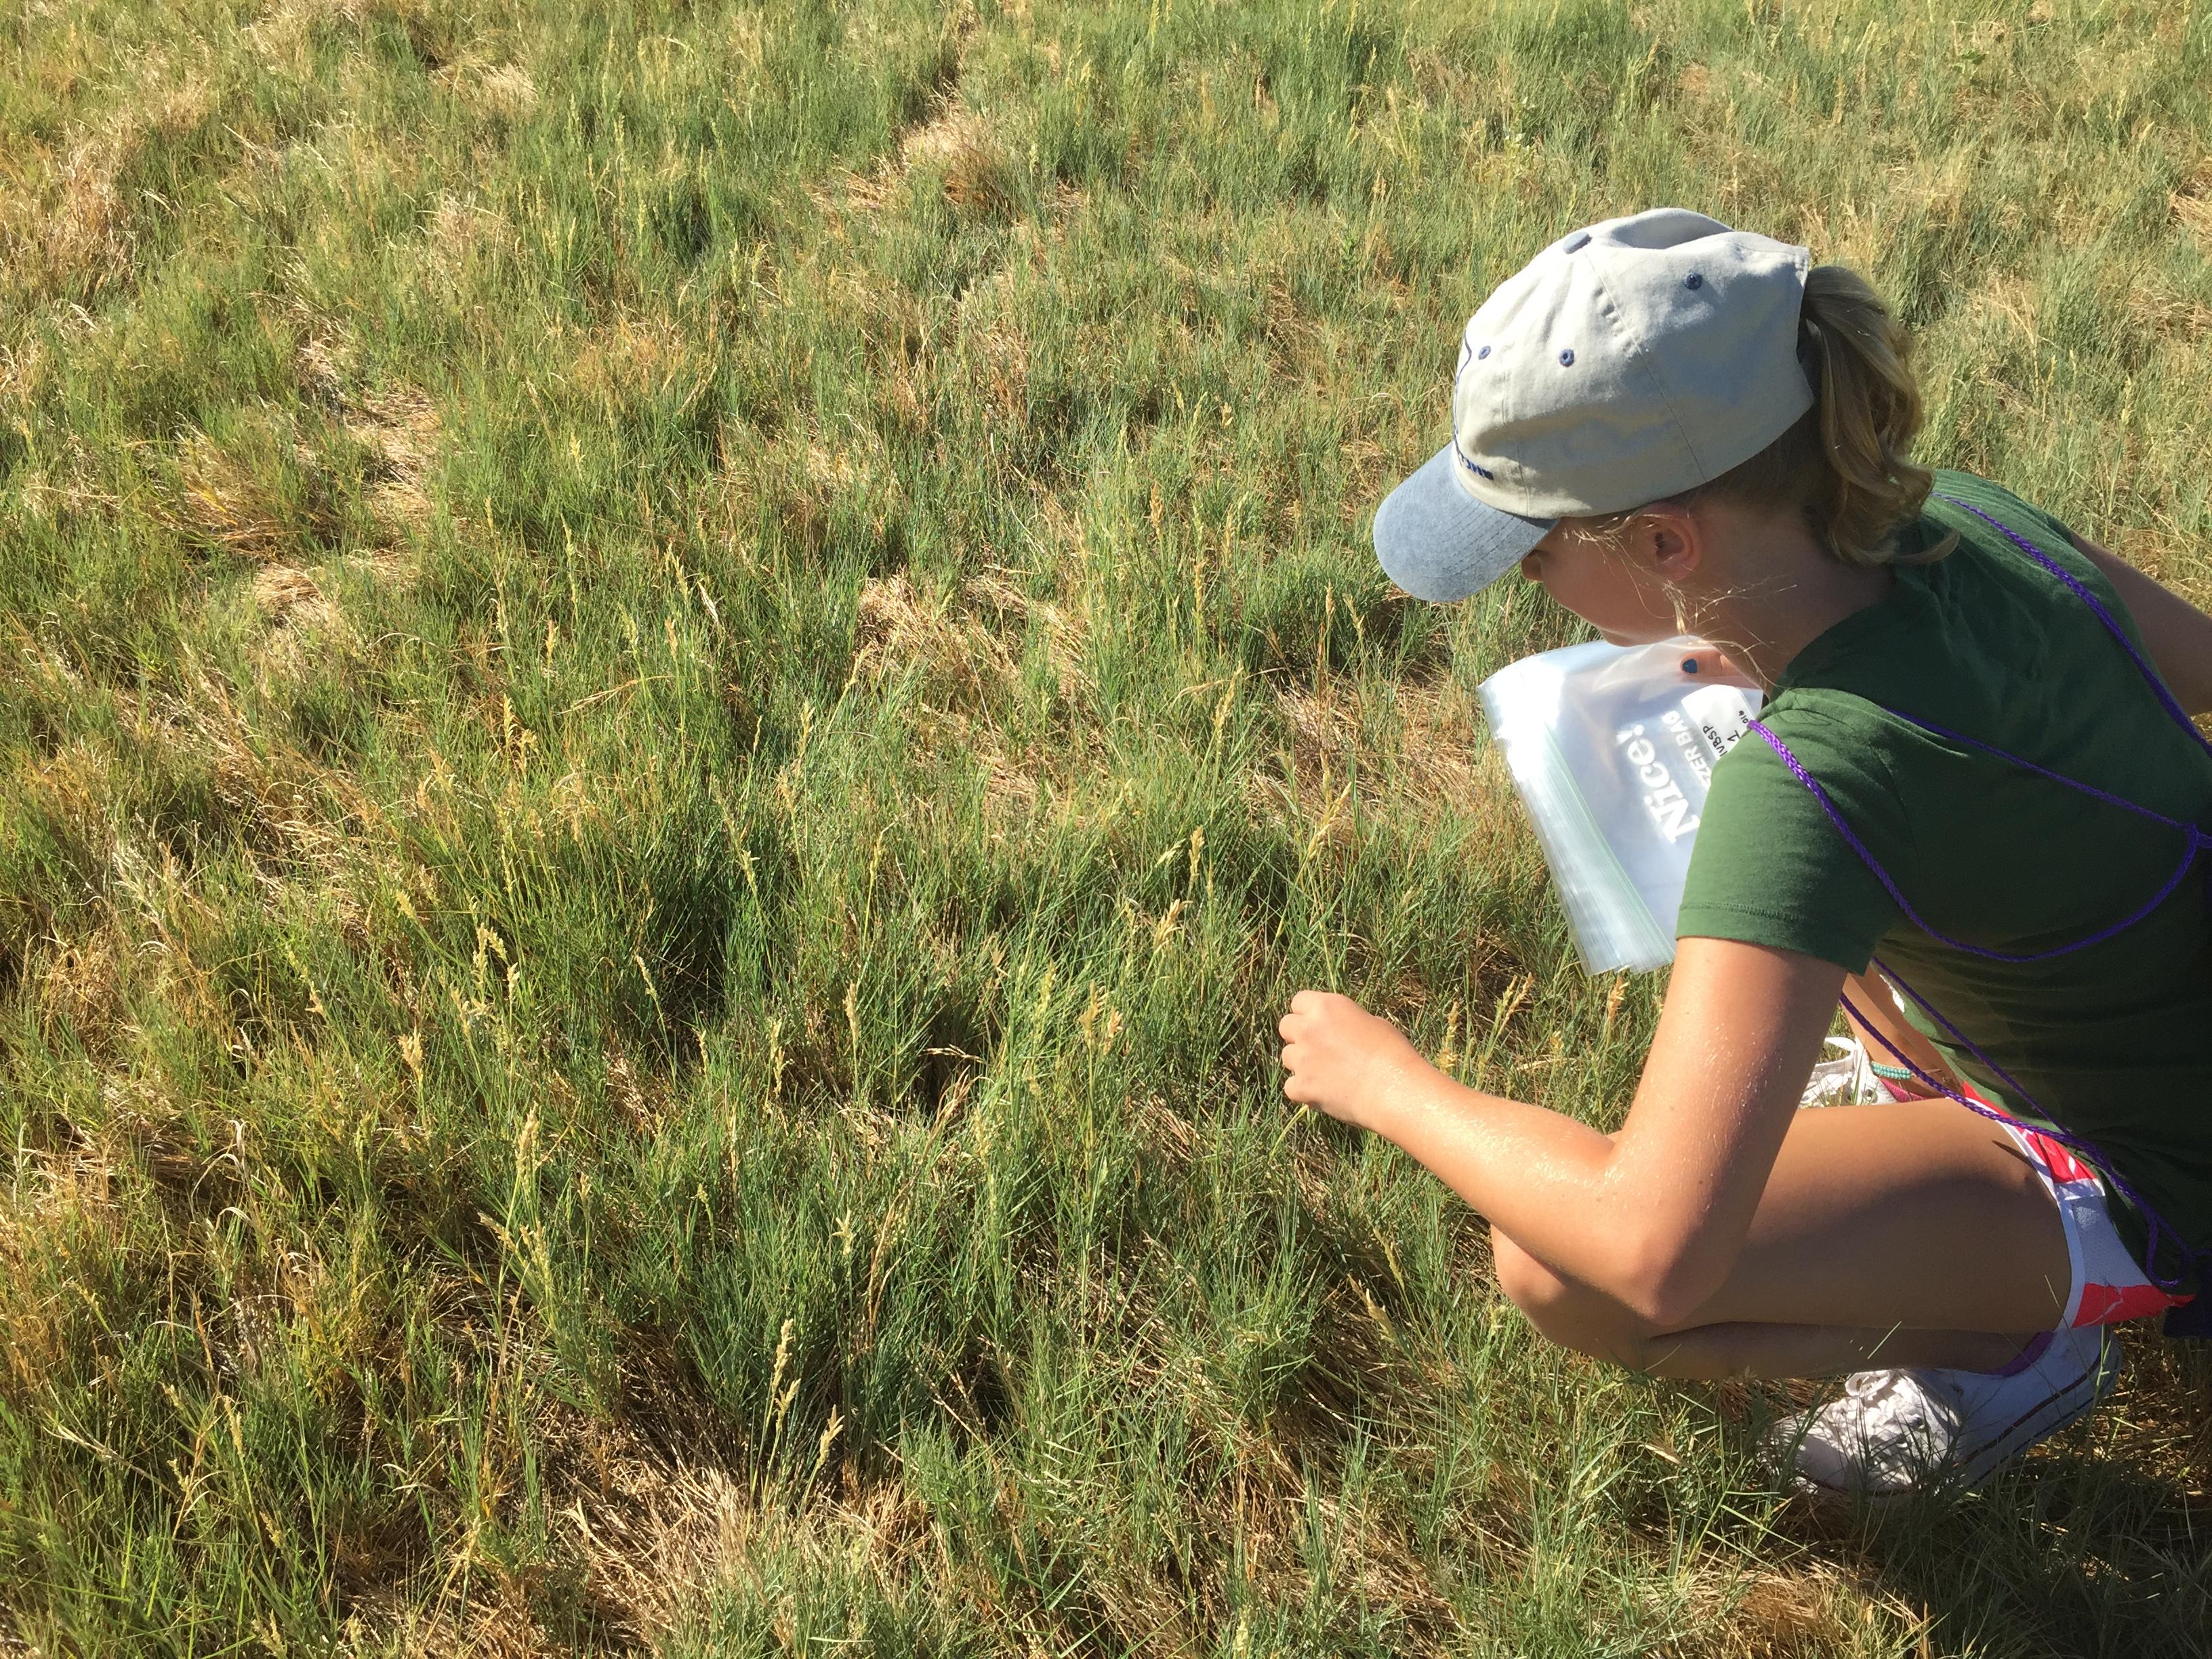 Examining the tall grass